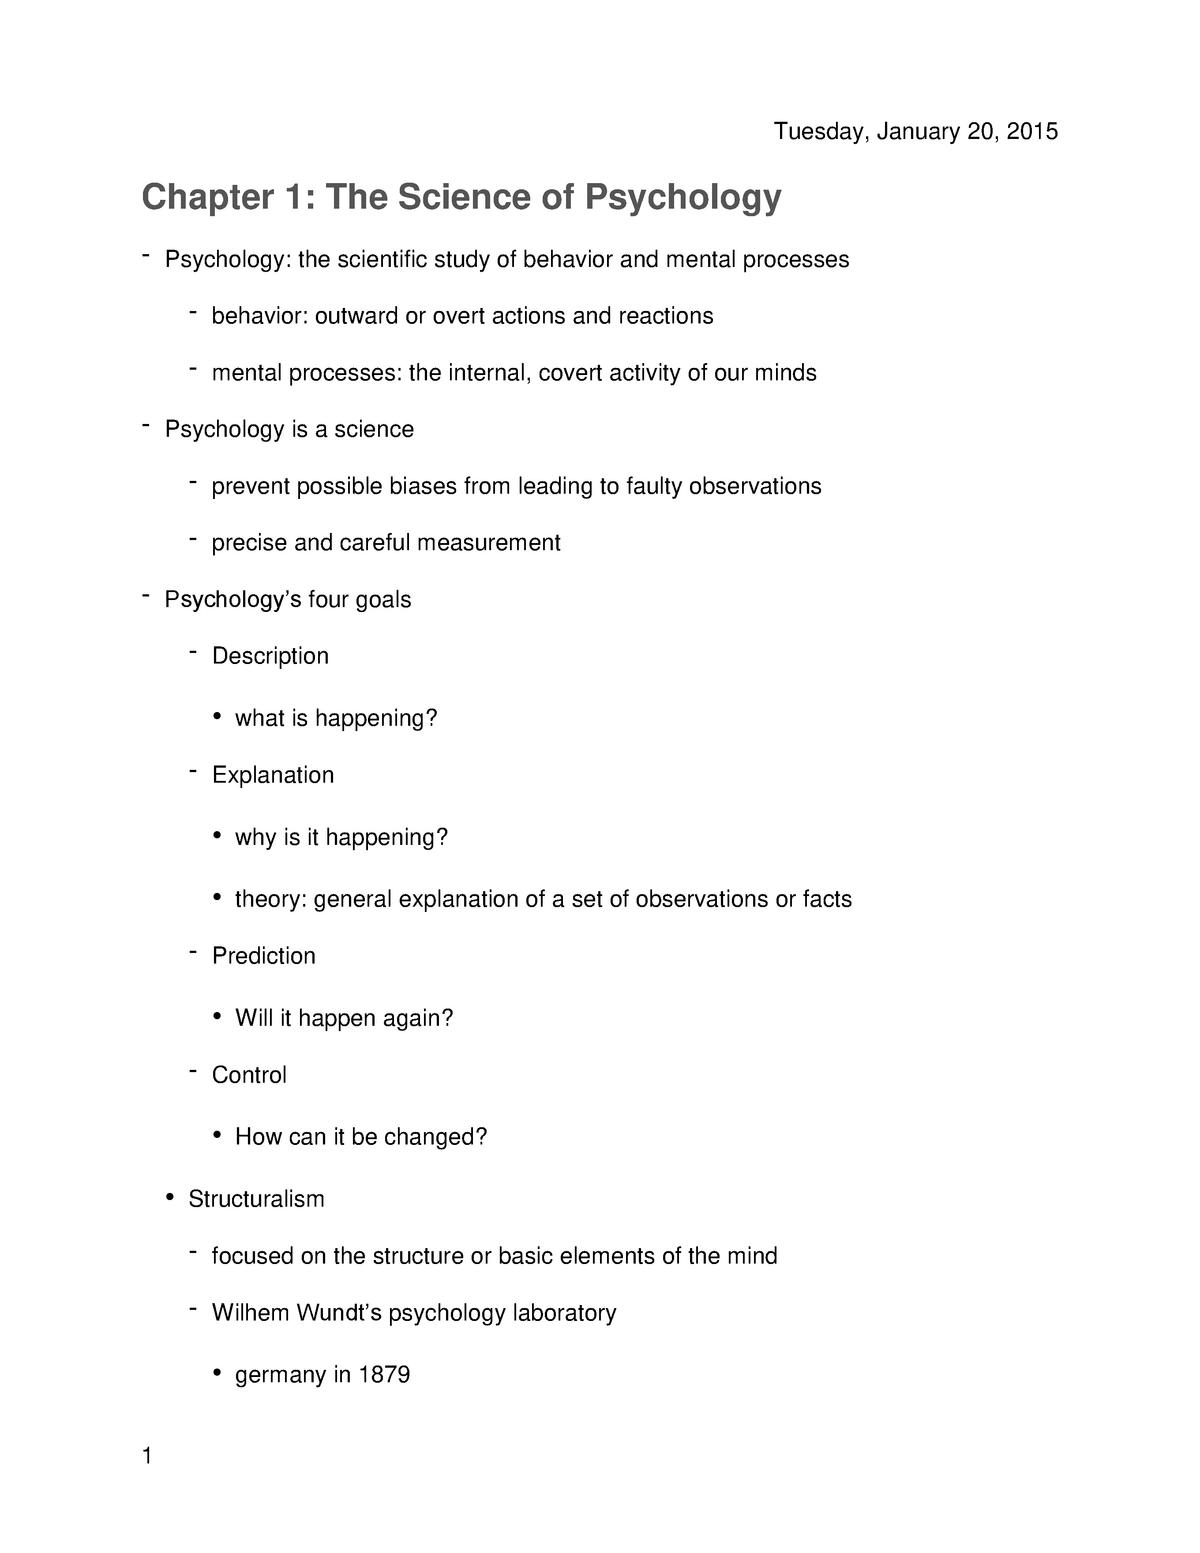 Summary - chapters 1-3, 5, 8, 9, 11, 12 - PSY 1300 - StuDocu